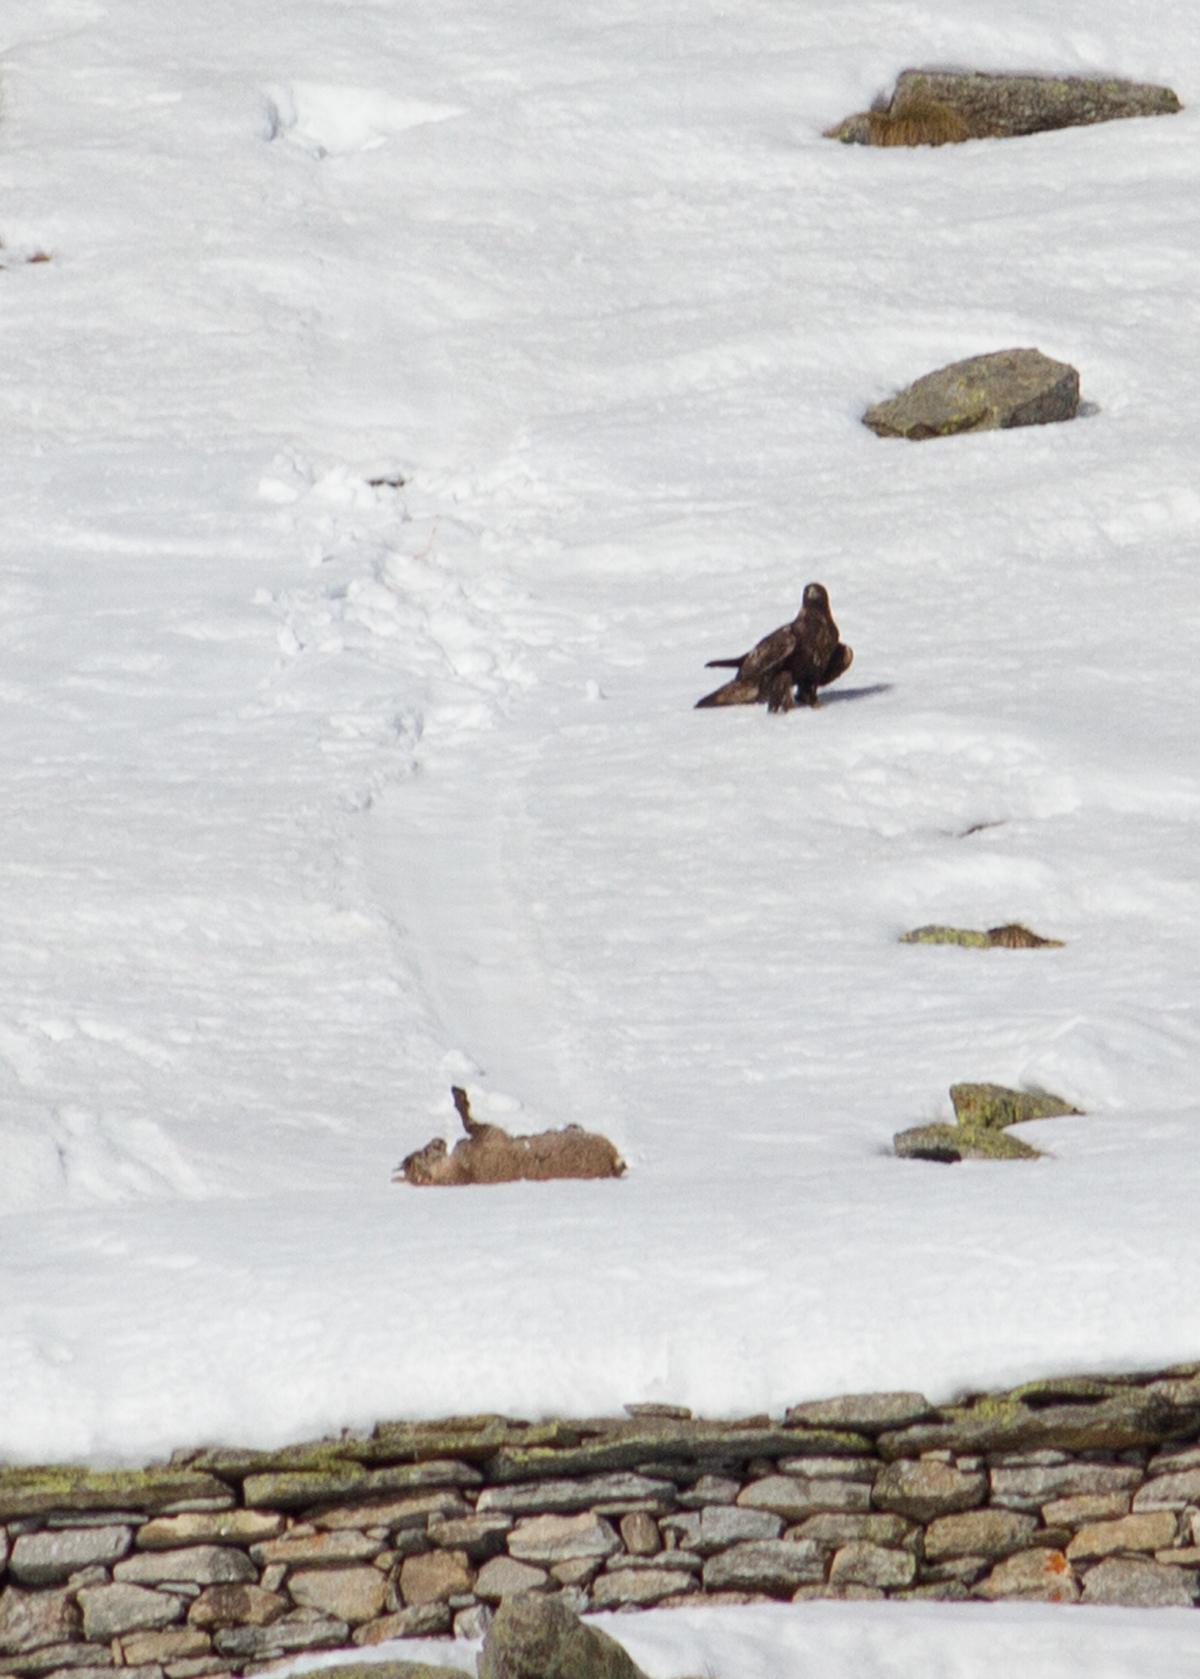 Aquila attacks ibex...